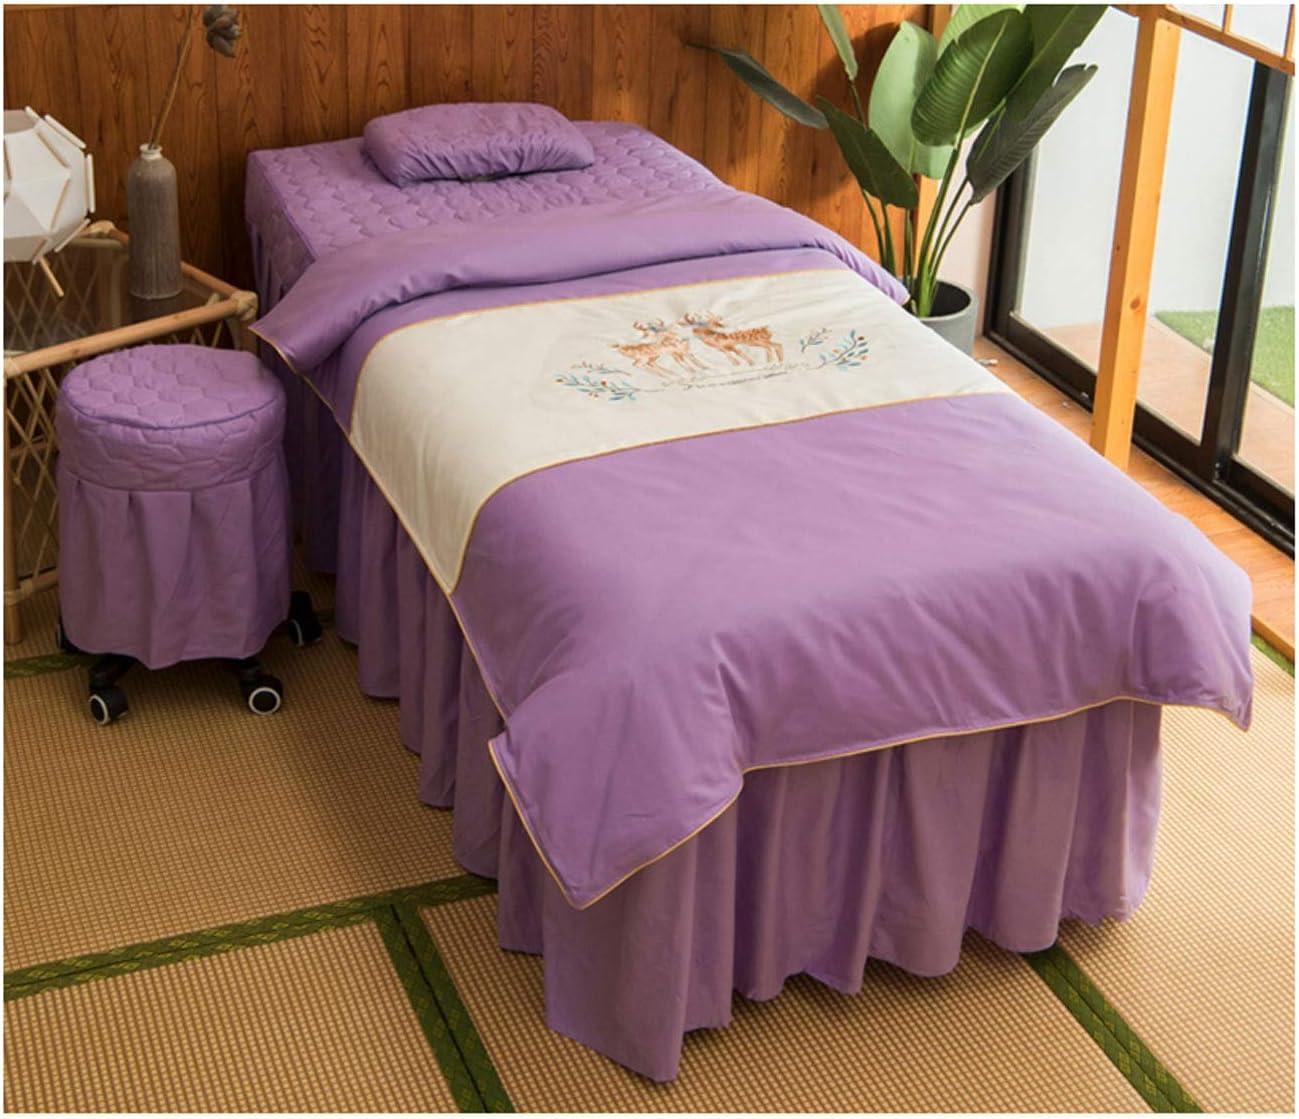 4-Piece Microfiber Massage Classic Table Sheet Max 47% OFF Bedspread Fo - Set Beauty